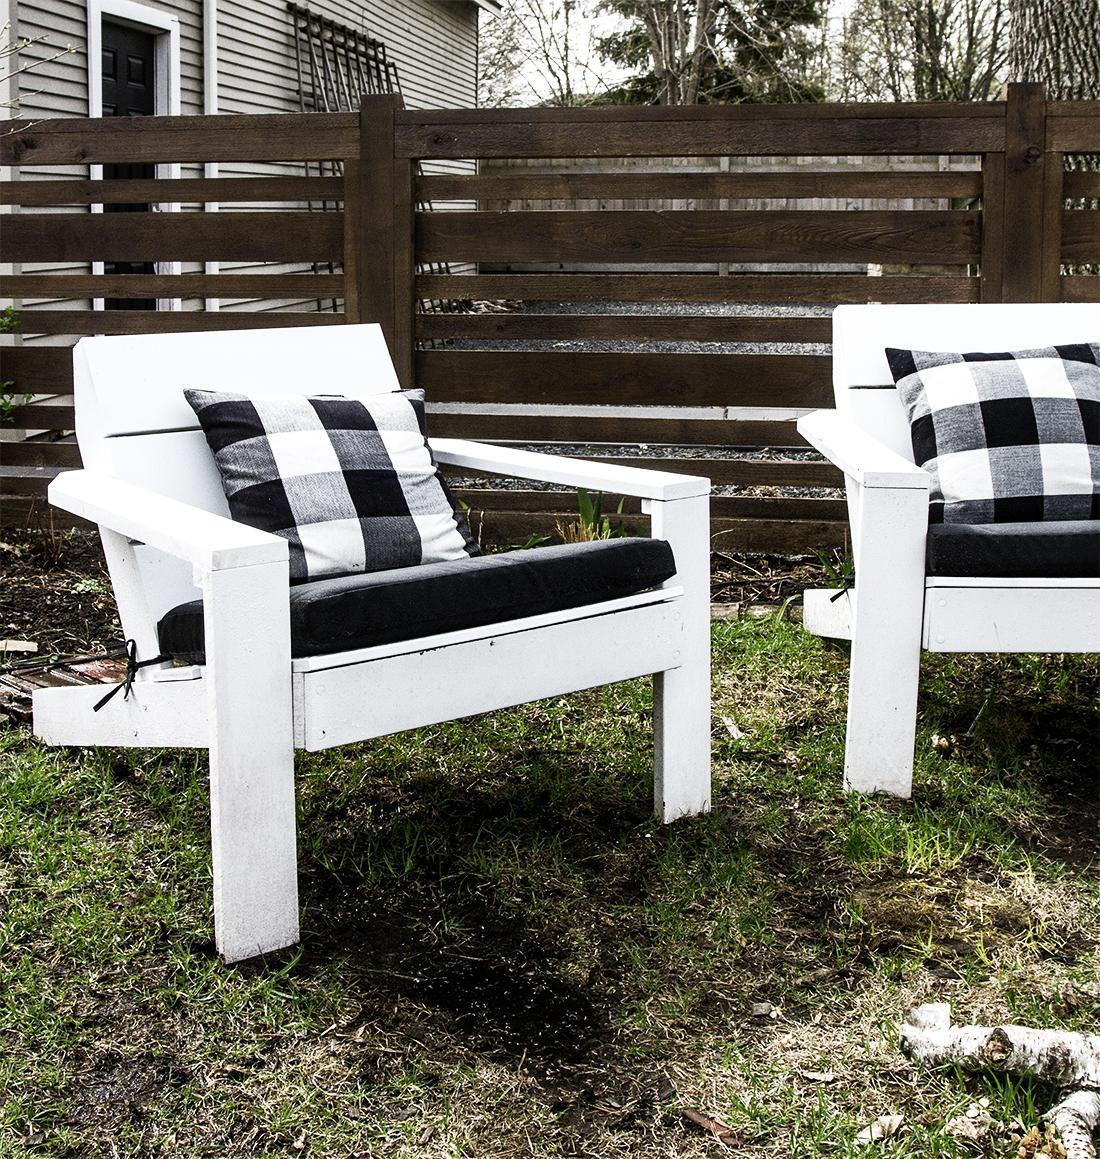 Modern Adirondack Chair with Cushions | Deuce Cities Henhouse